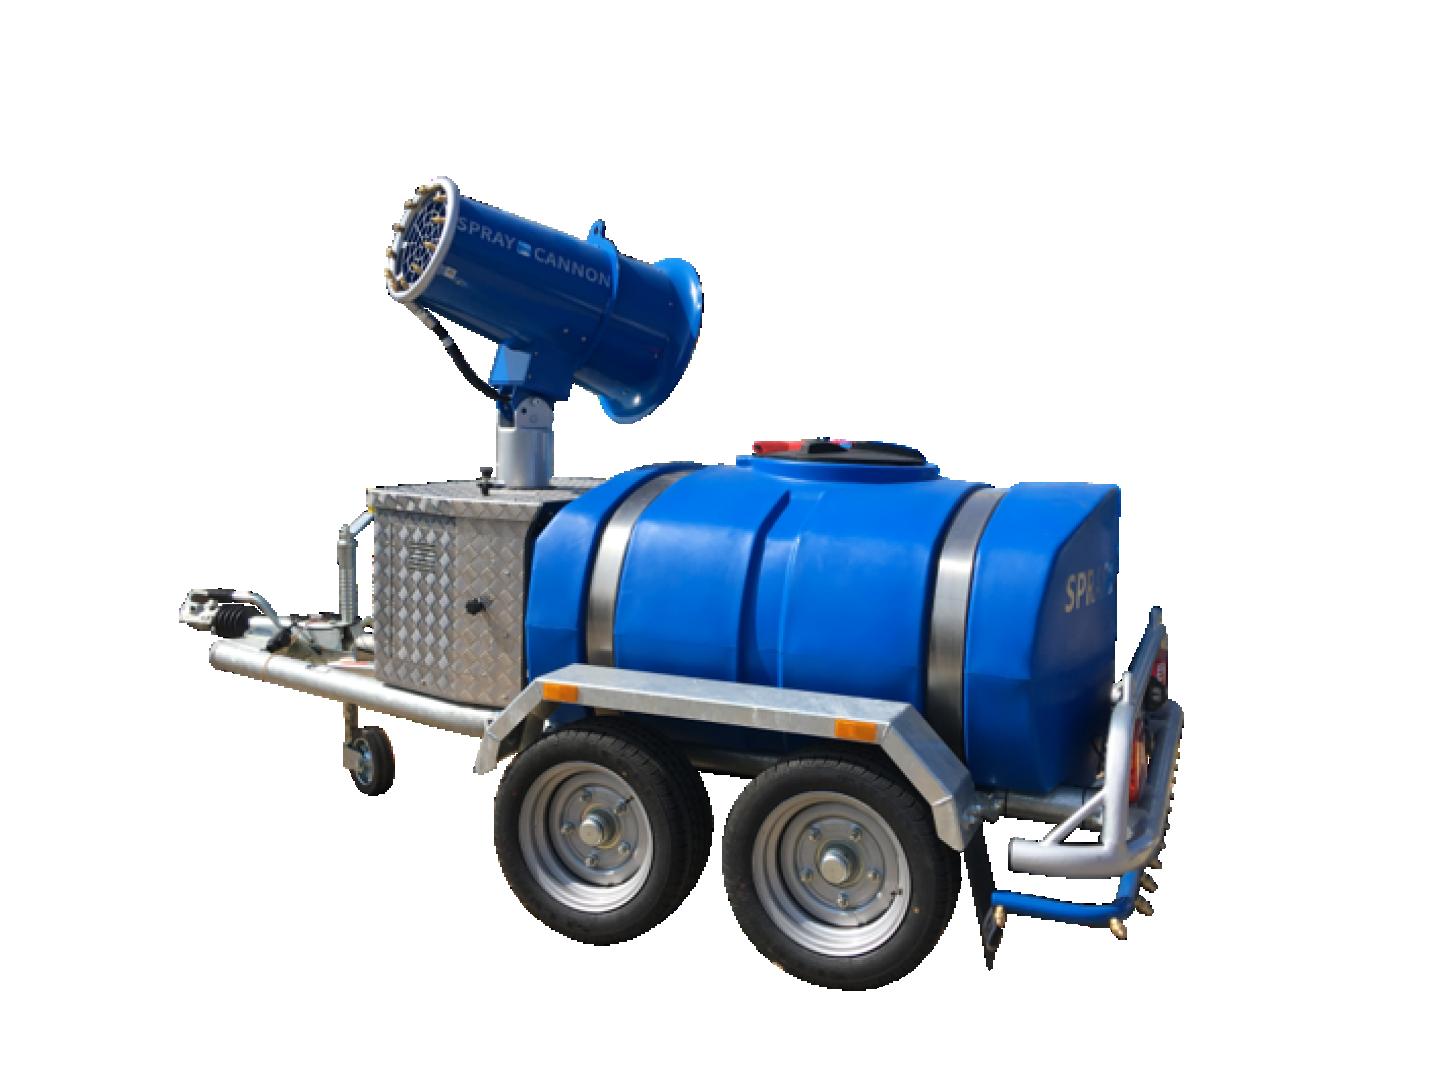 Spraycannon 25 SS